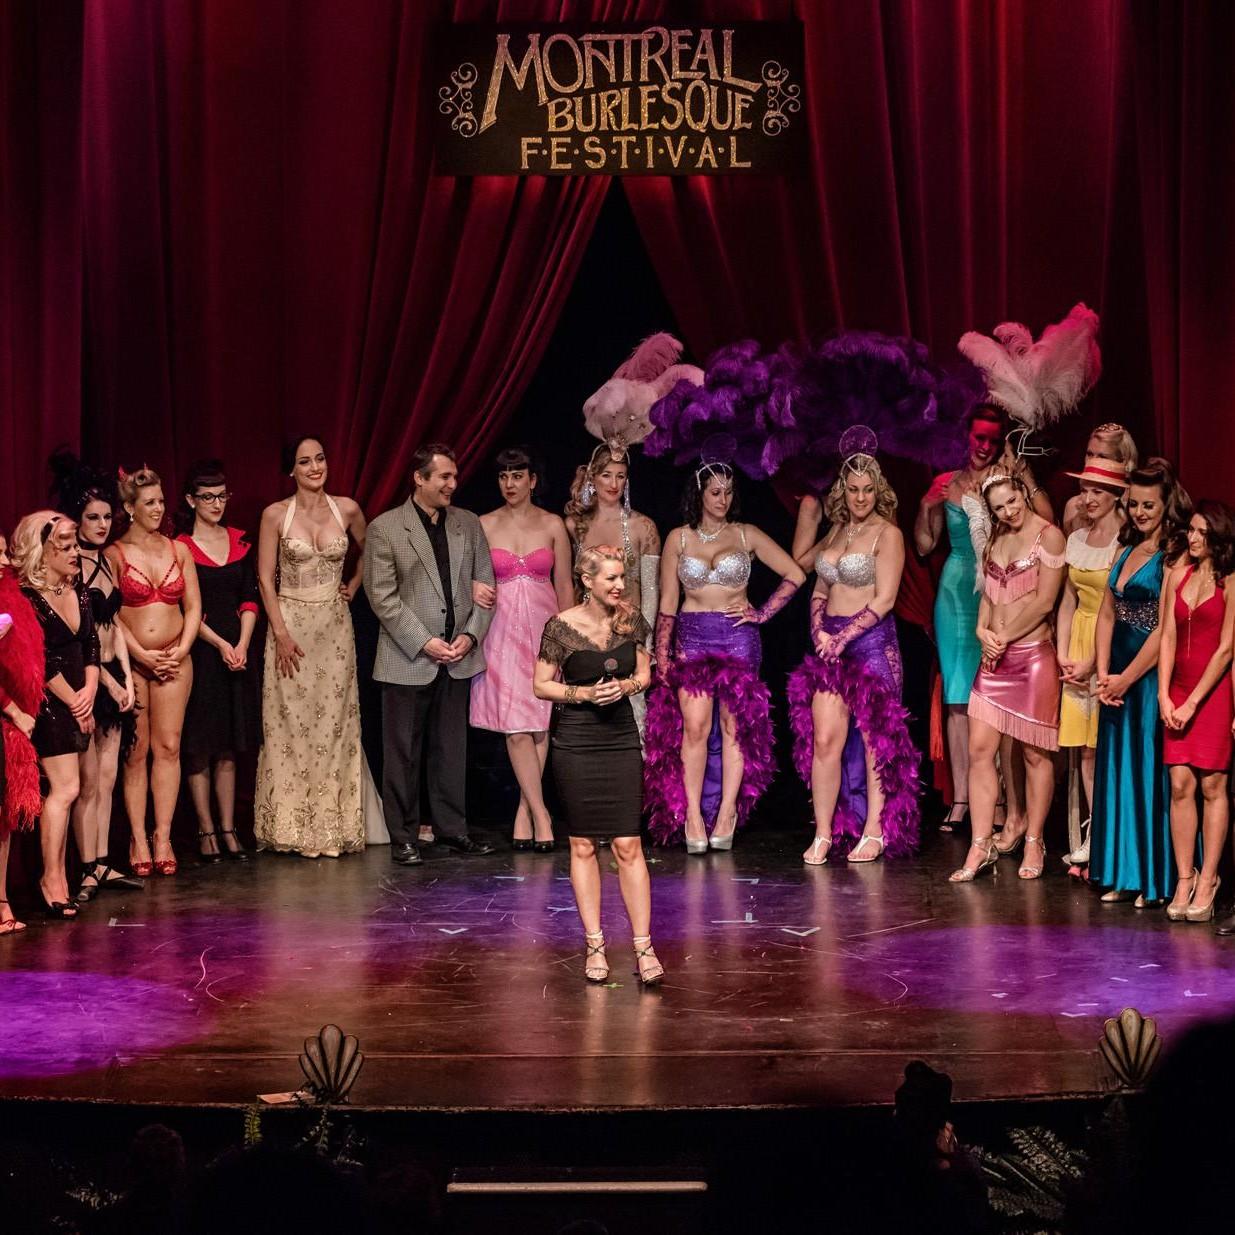 montreal-burlesque-festival-2016-8